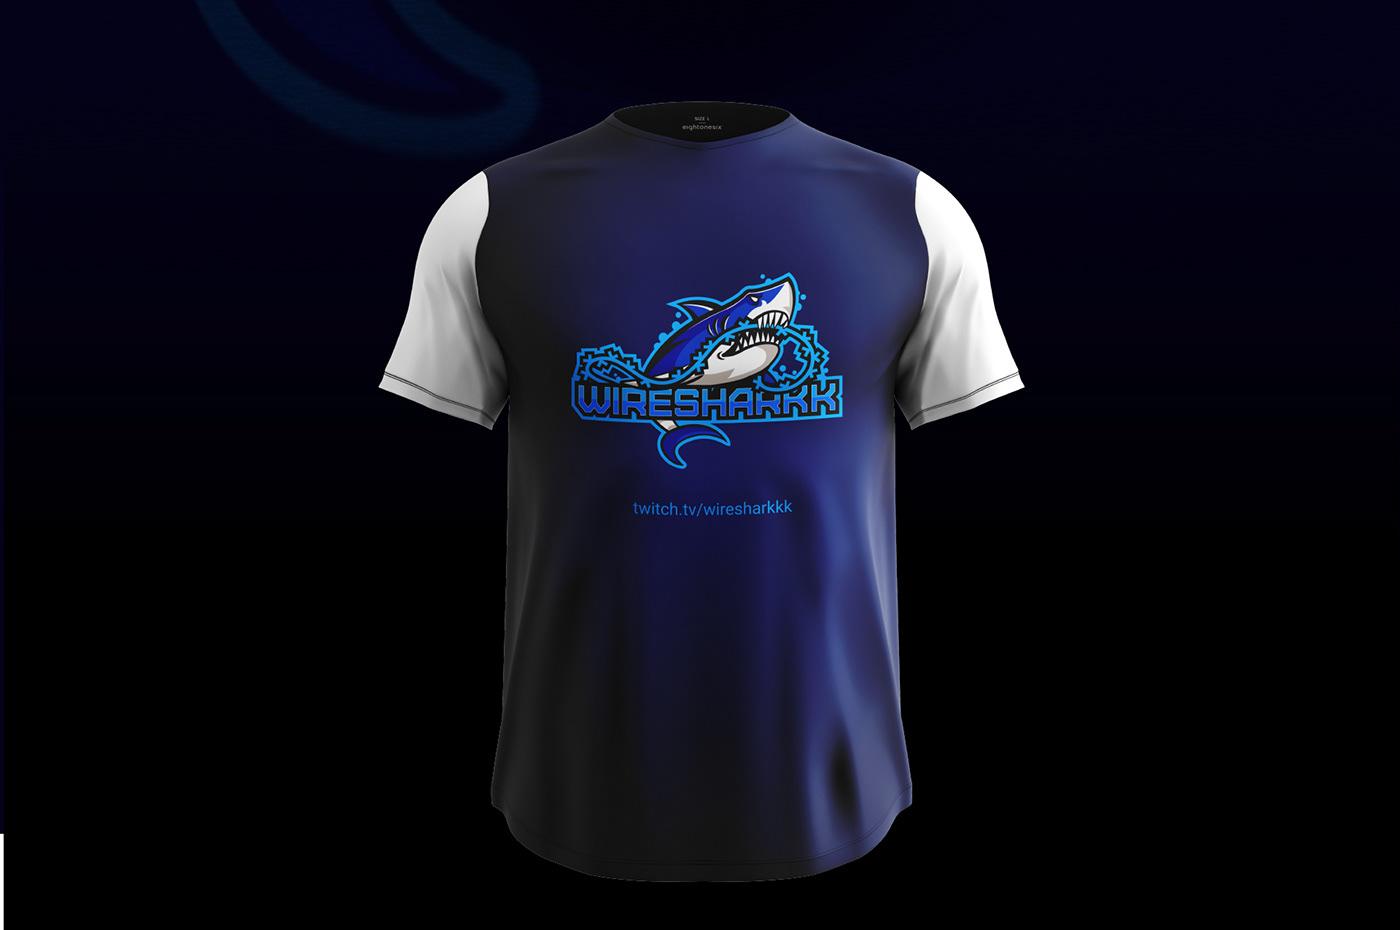 logo of a shark on thshirt